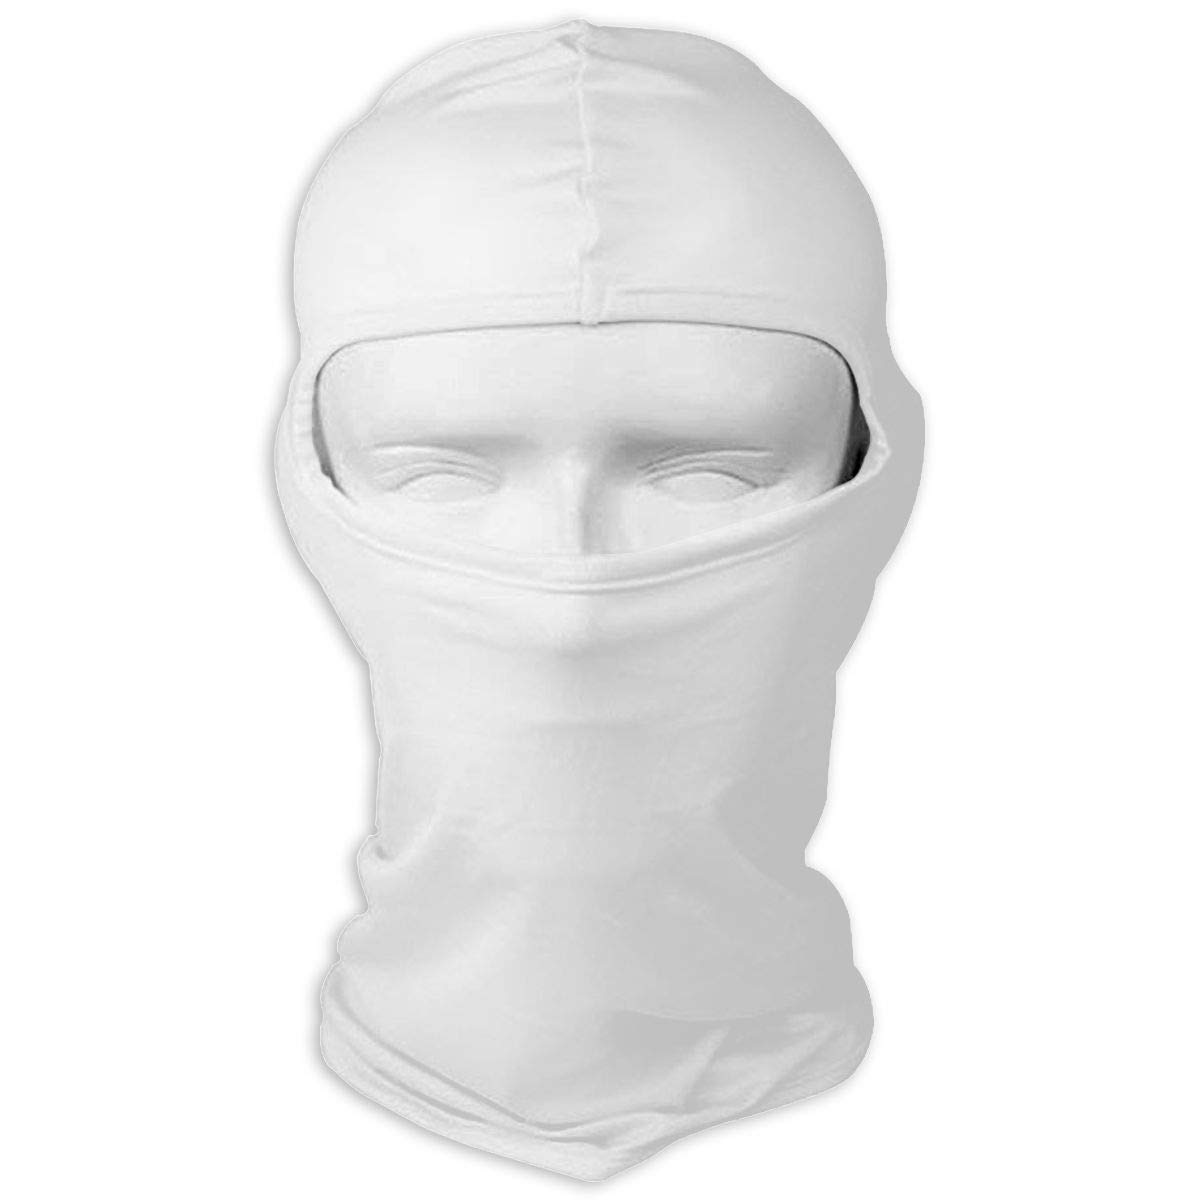 Running Wild Horse Winter Hiking Full Face Mask Windproof Head Hood for Men and Women ferfgrg